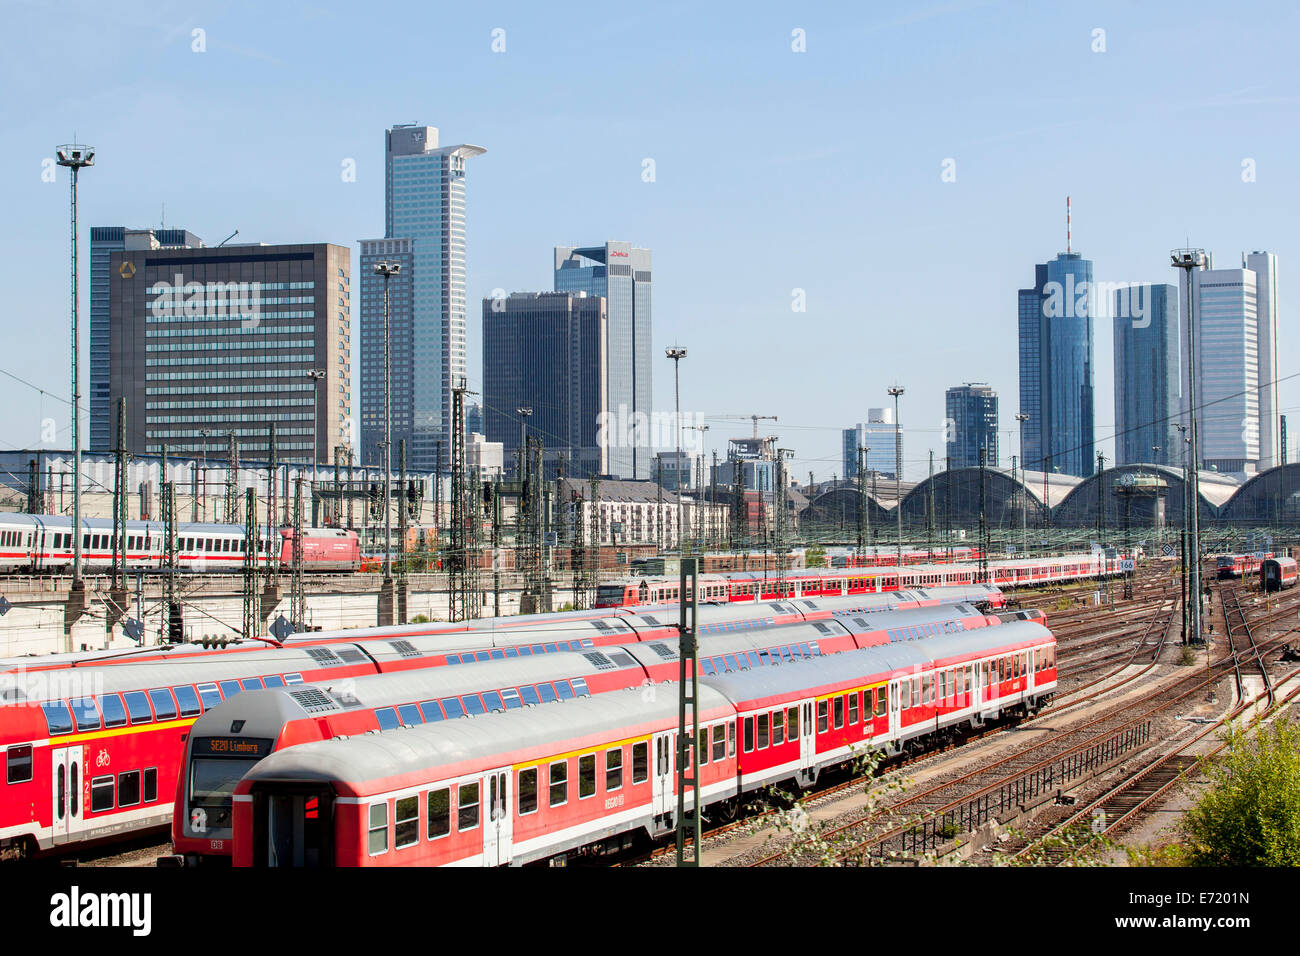 Railway tracks, sidings, of Deutsche Bahn AG at Frankfurt main station, Frankfurt skyline at the back, Frankfurt - Stock Image